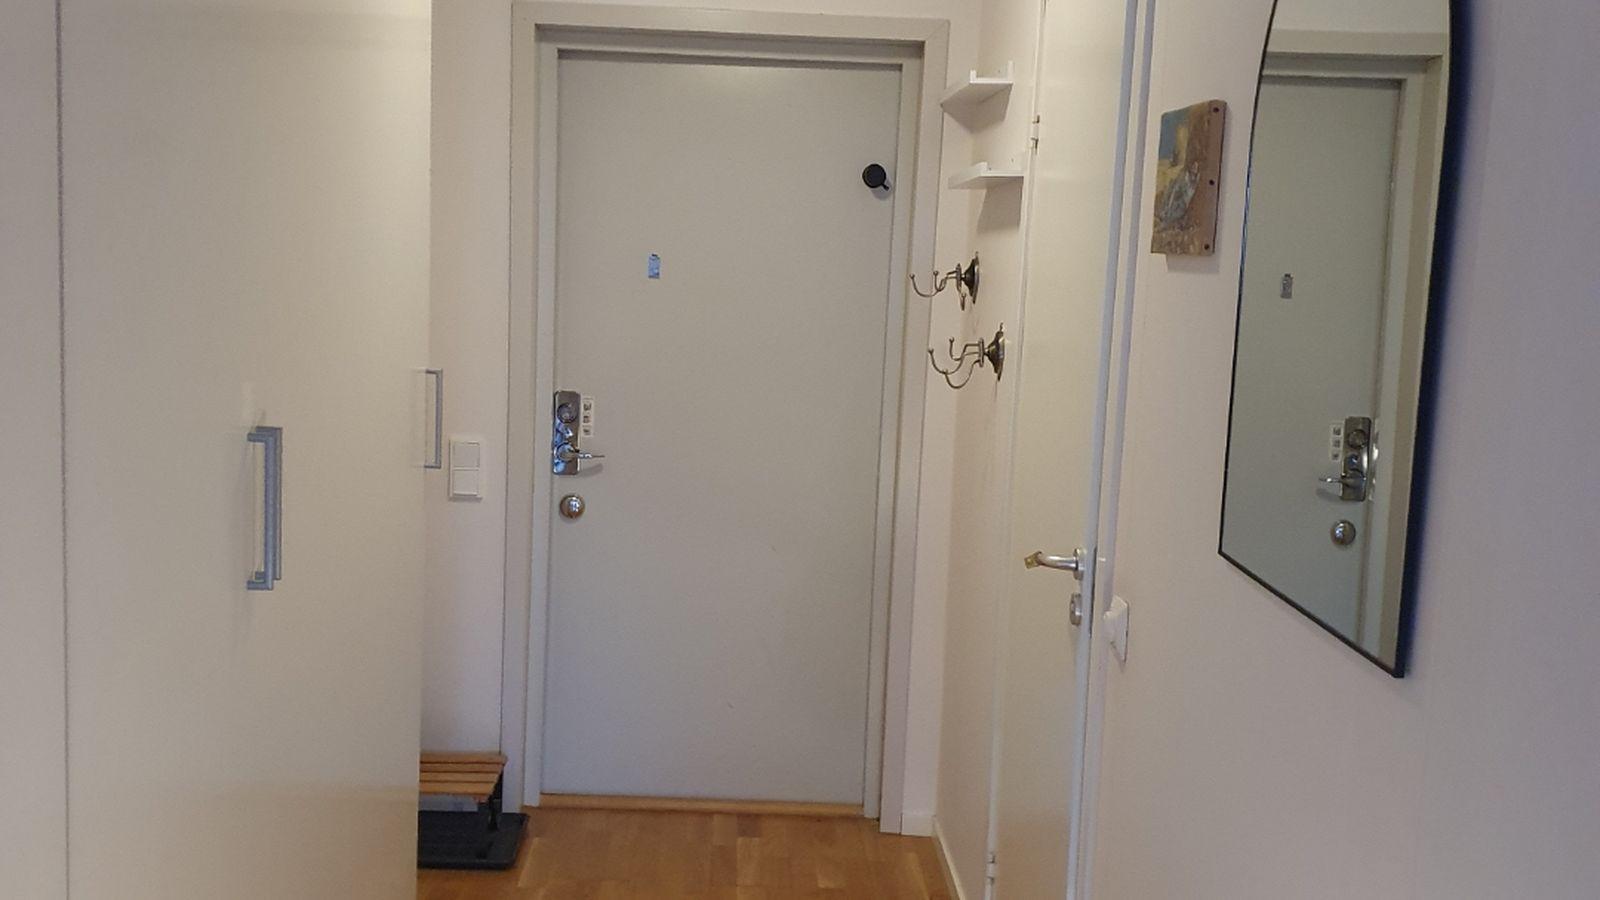 Ledig lägenhet i Nacka